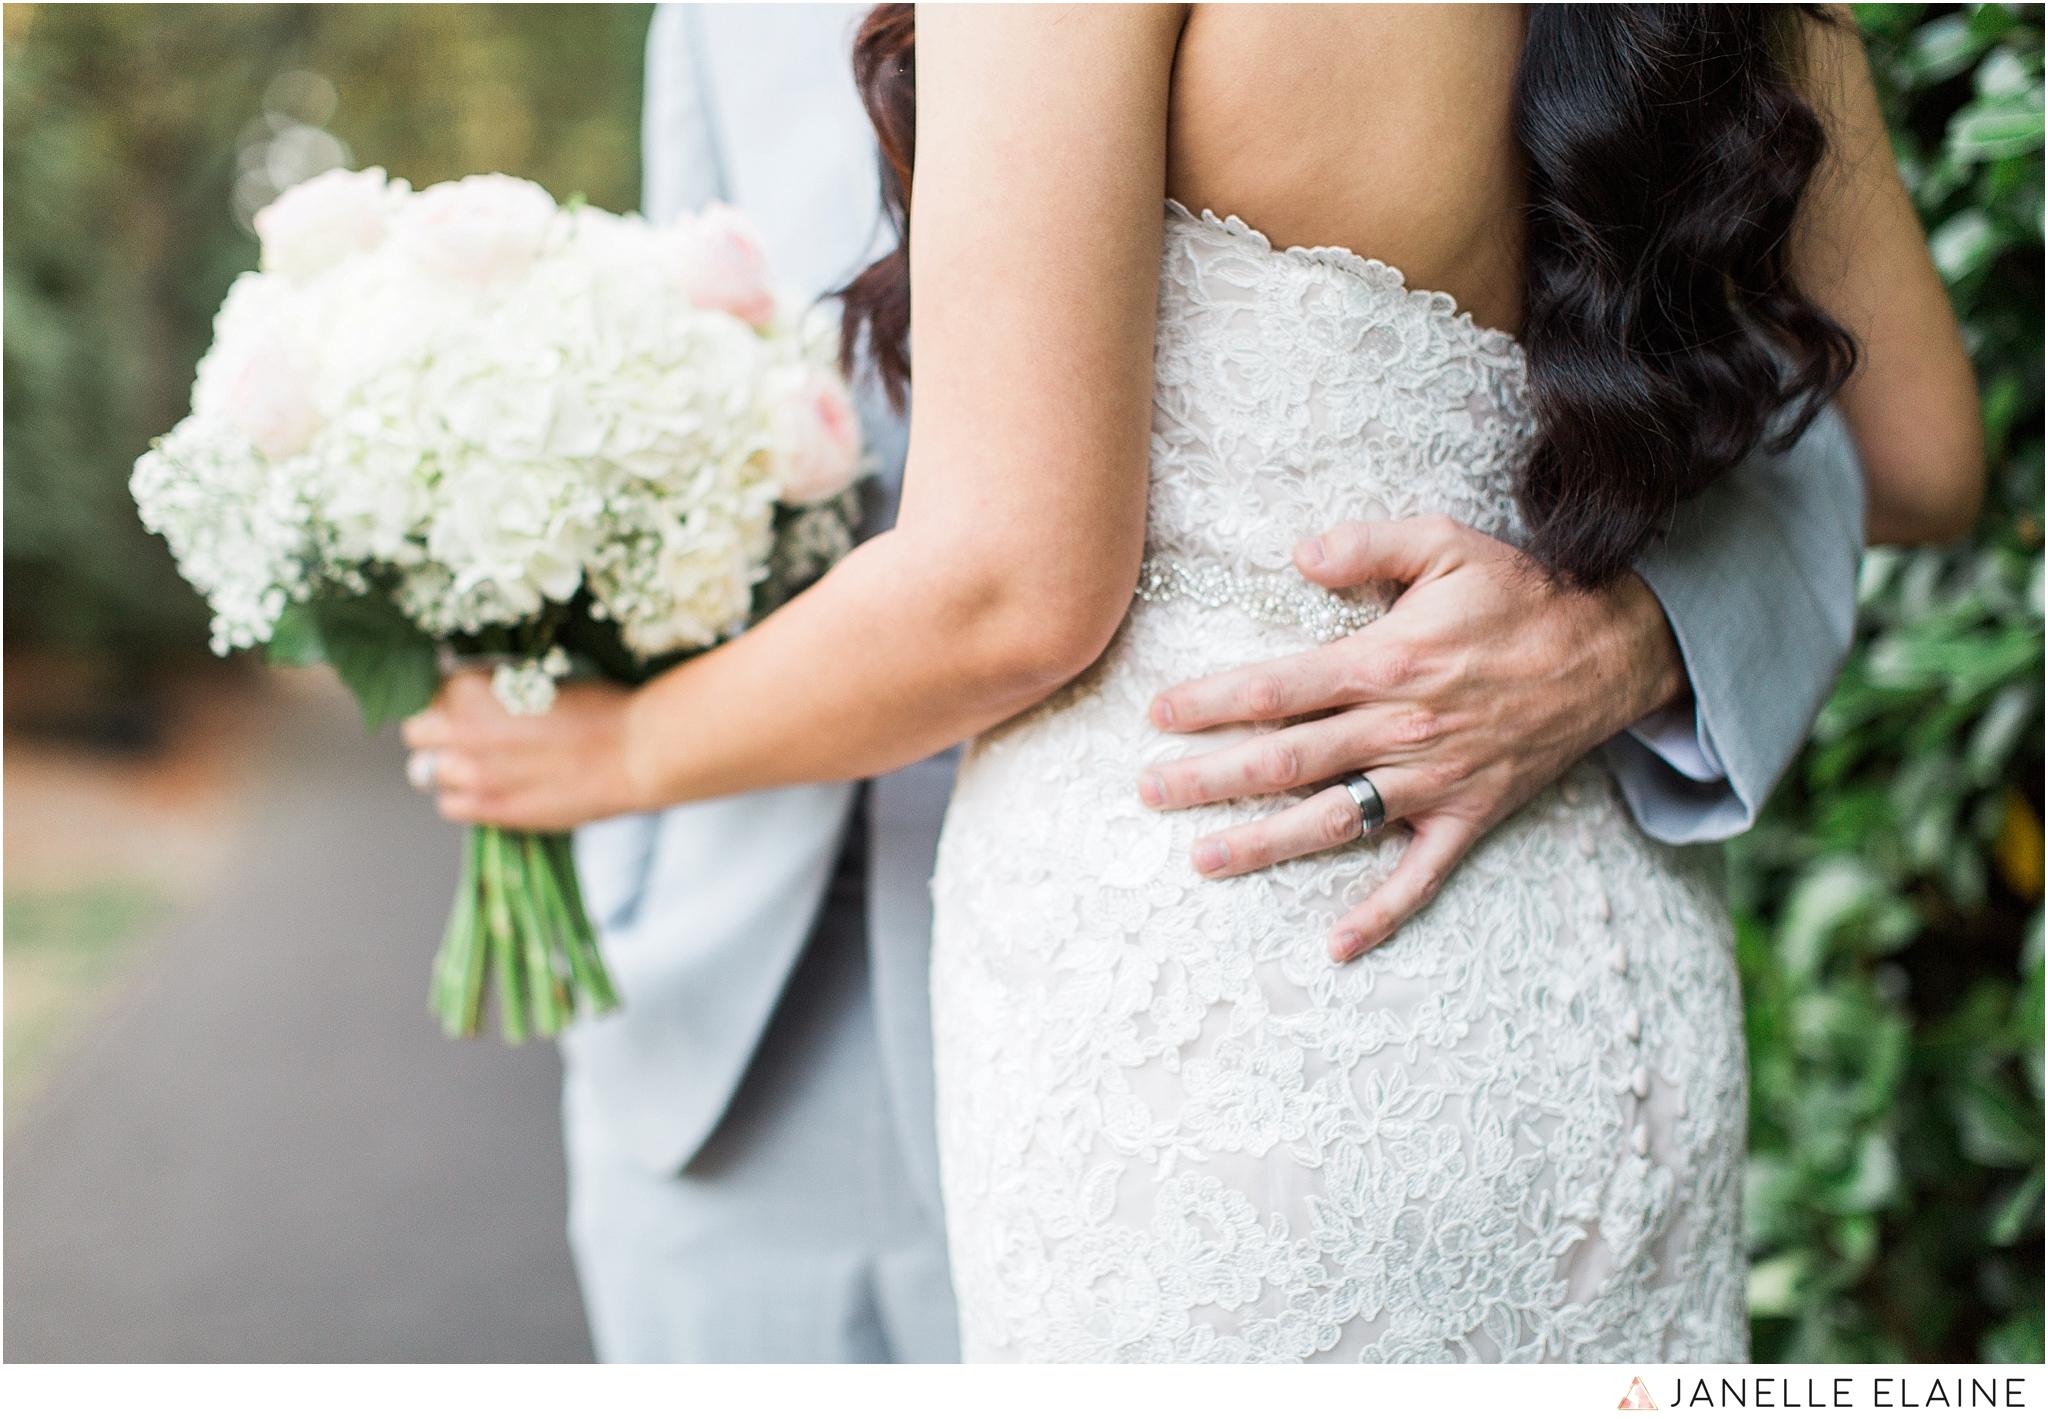 janelle elaine photography-professional wedding photographer-seattle-bellevue-robinswood house-210.jpg